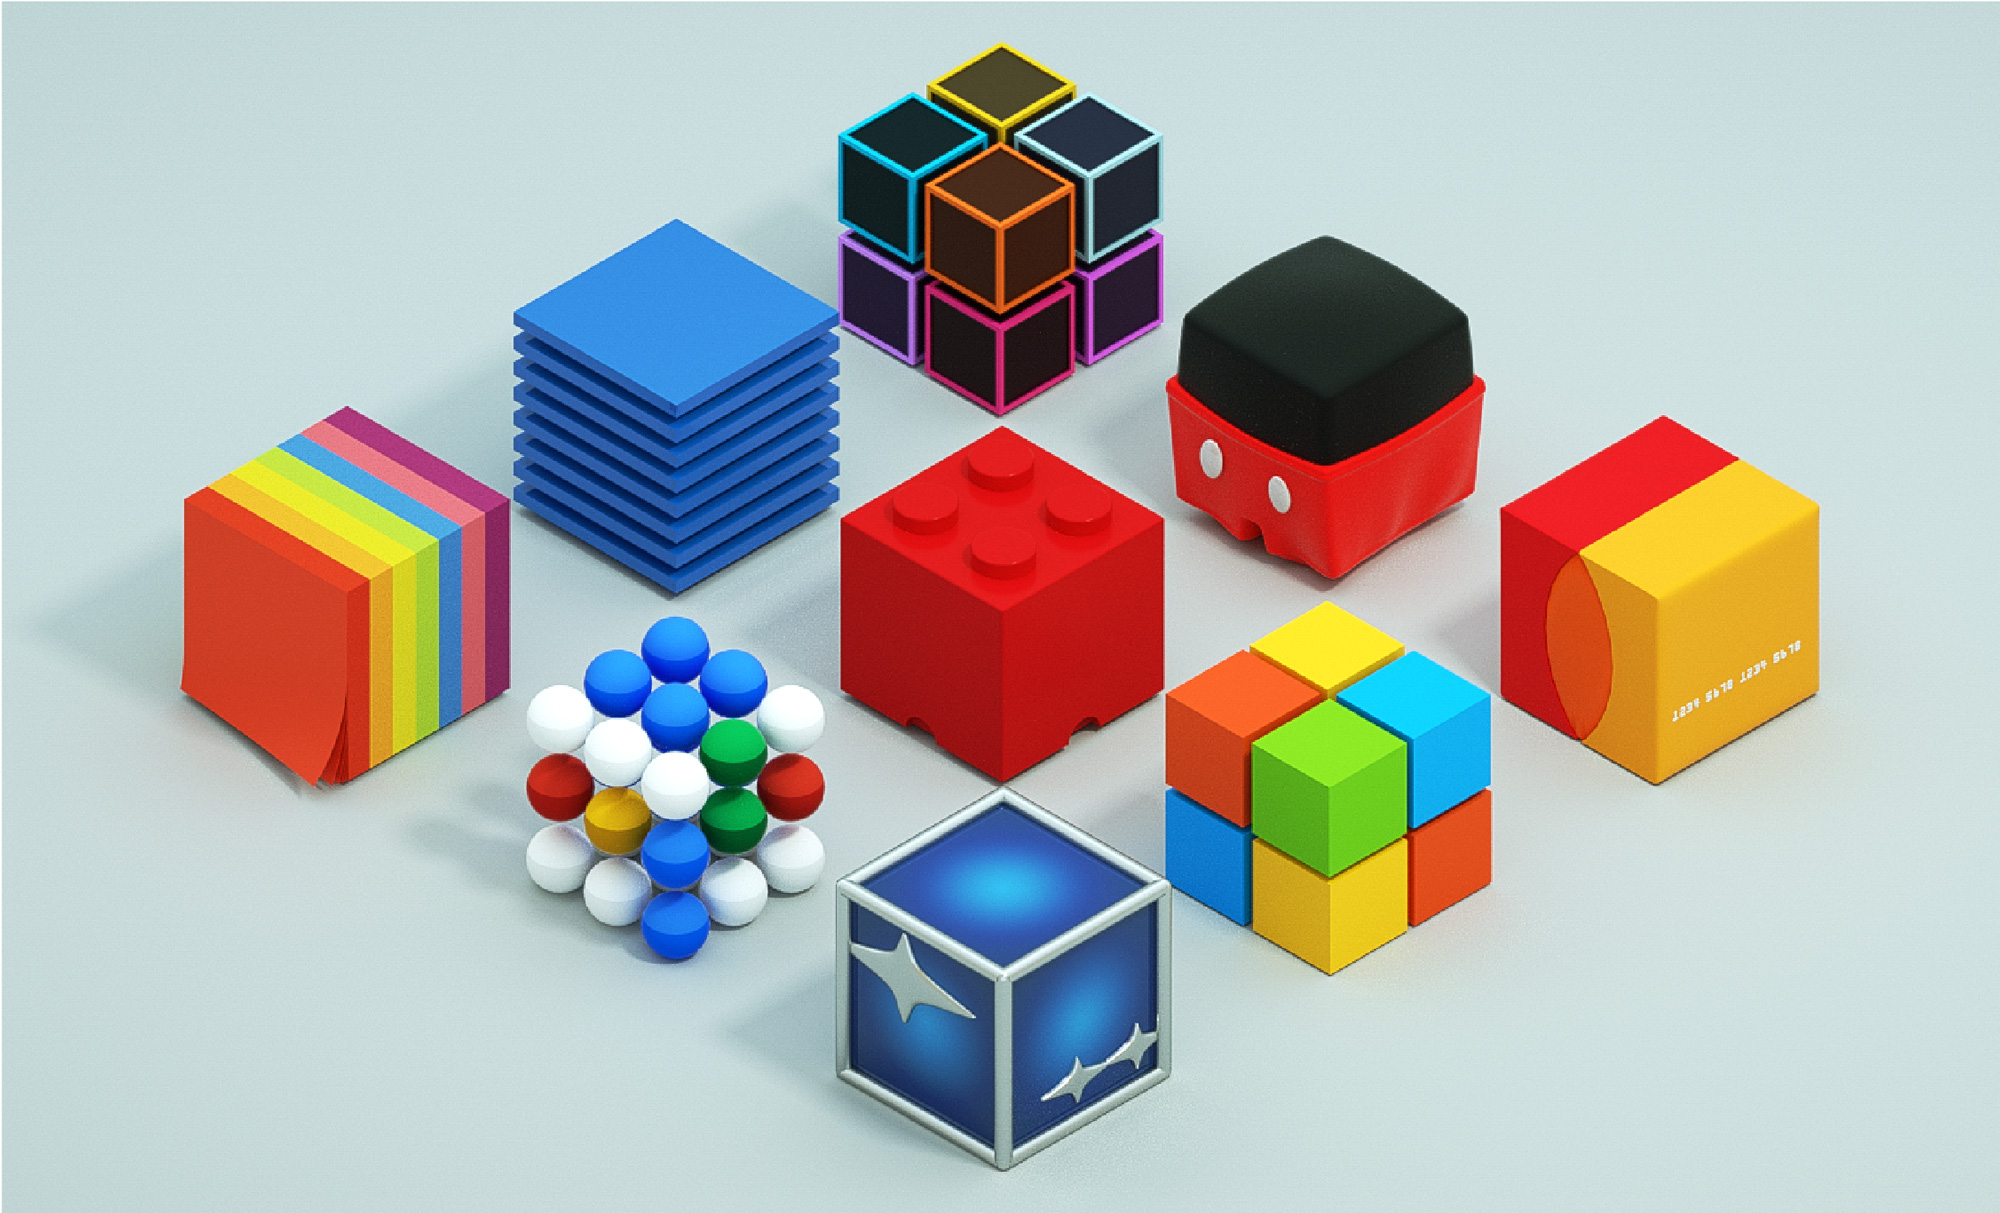 Branding Blocks